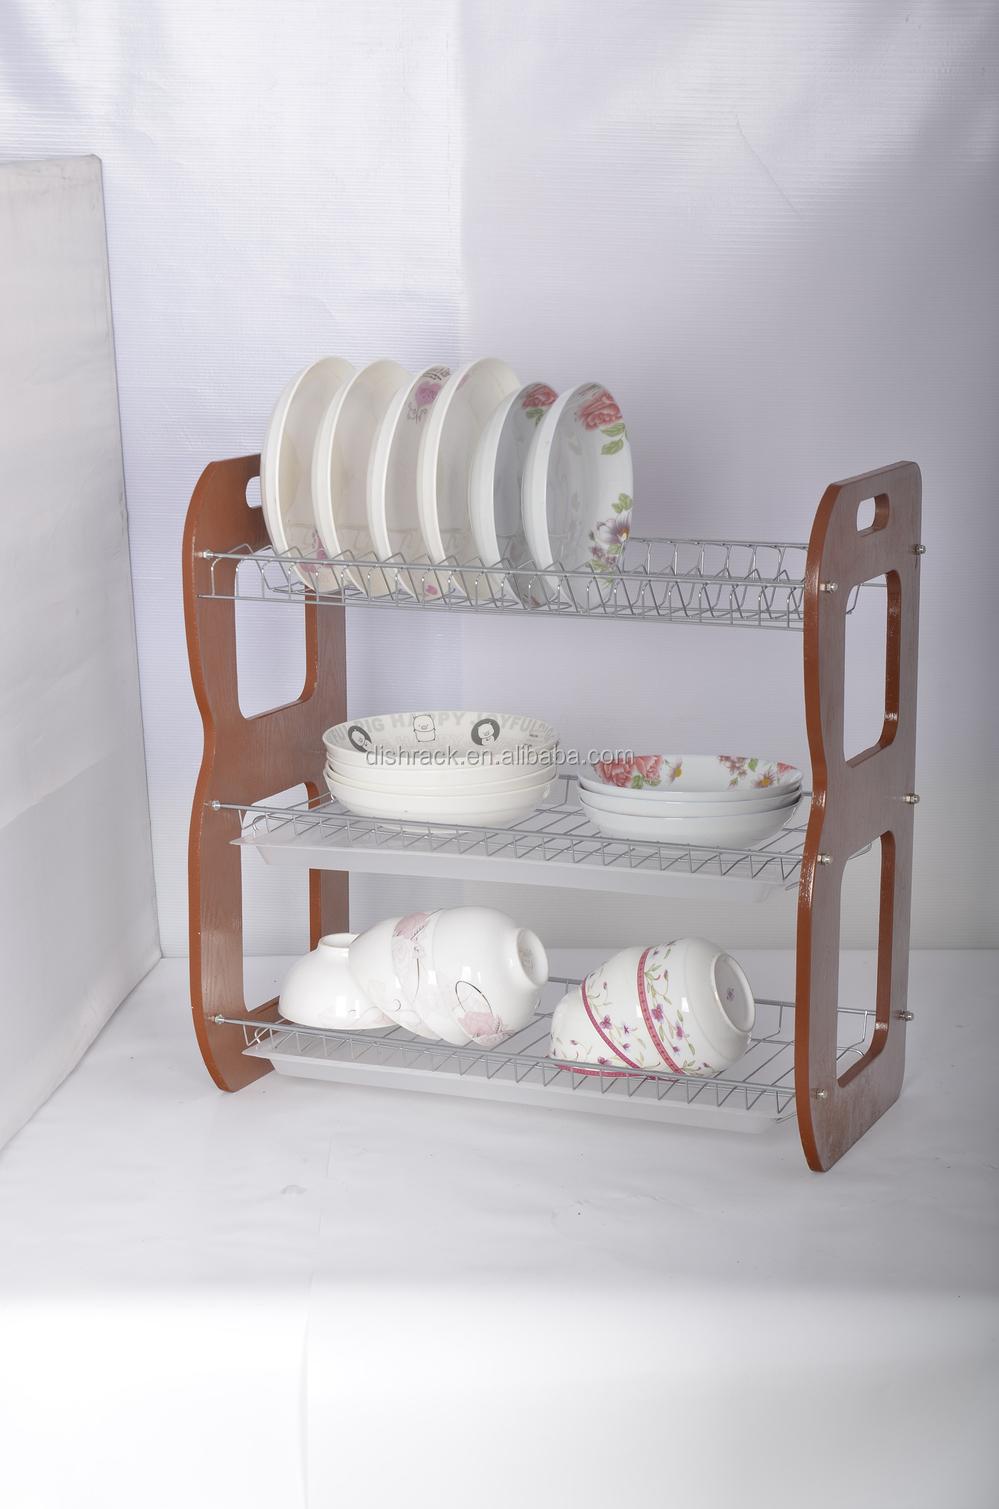 Plate Storage Rack Kitchen Dish Plate Metal Display Rack Kitchen Storage Rack Wall Mounted